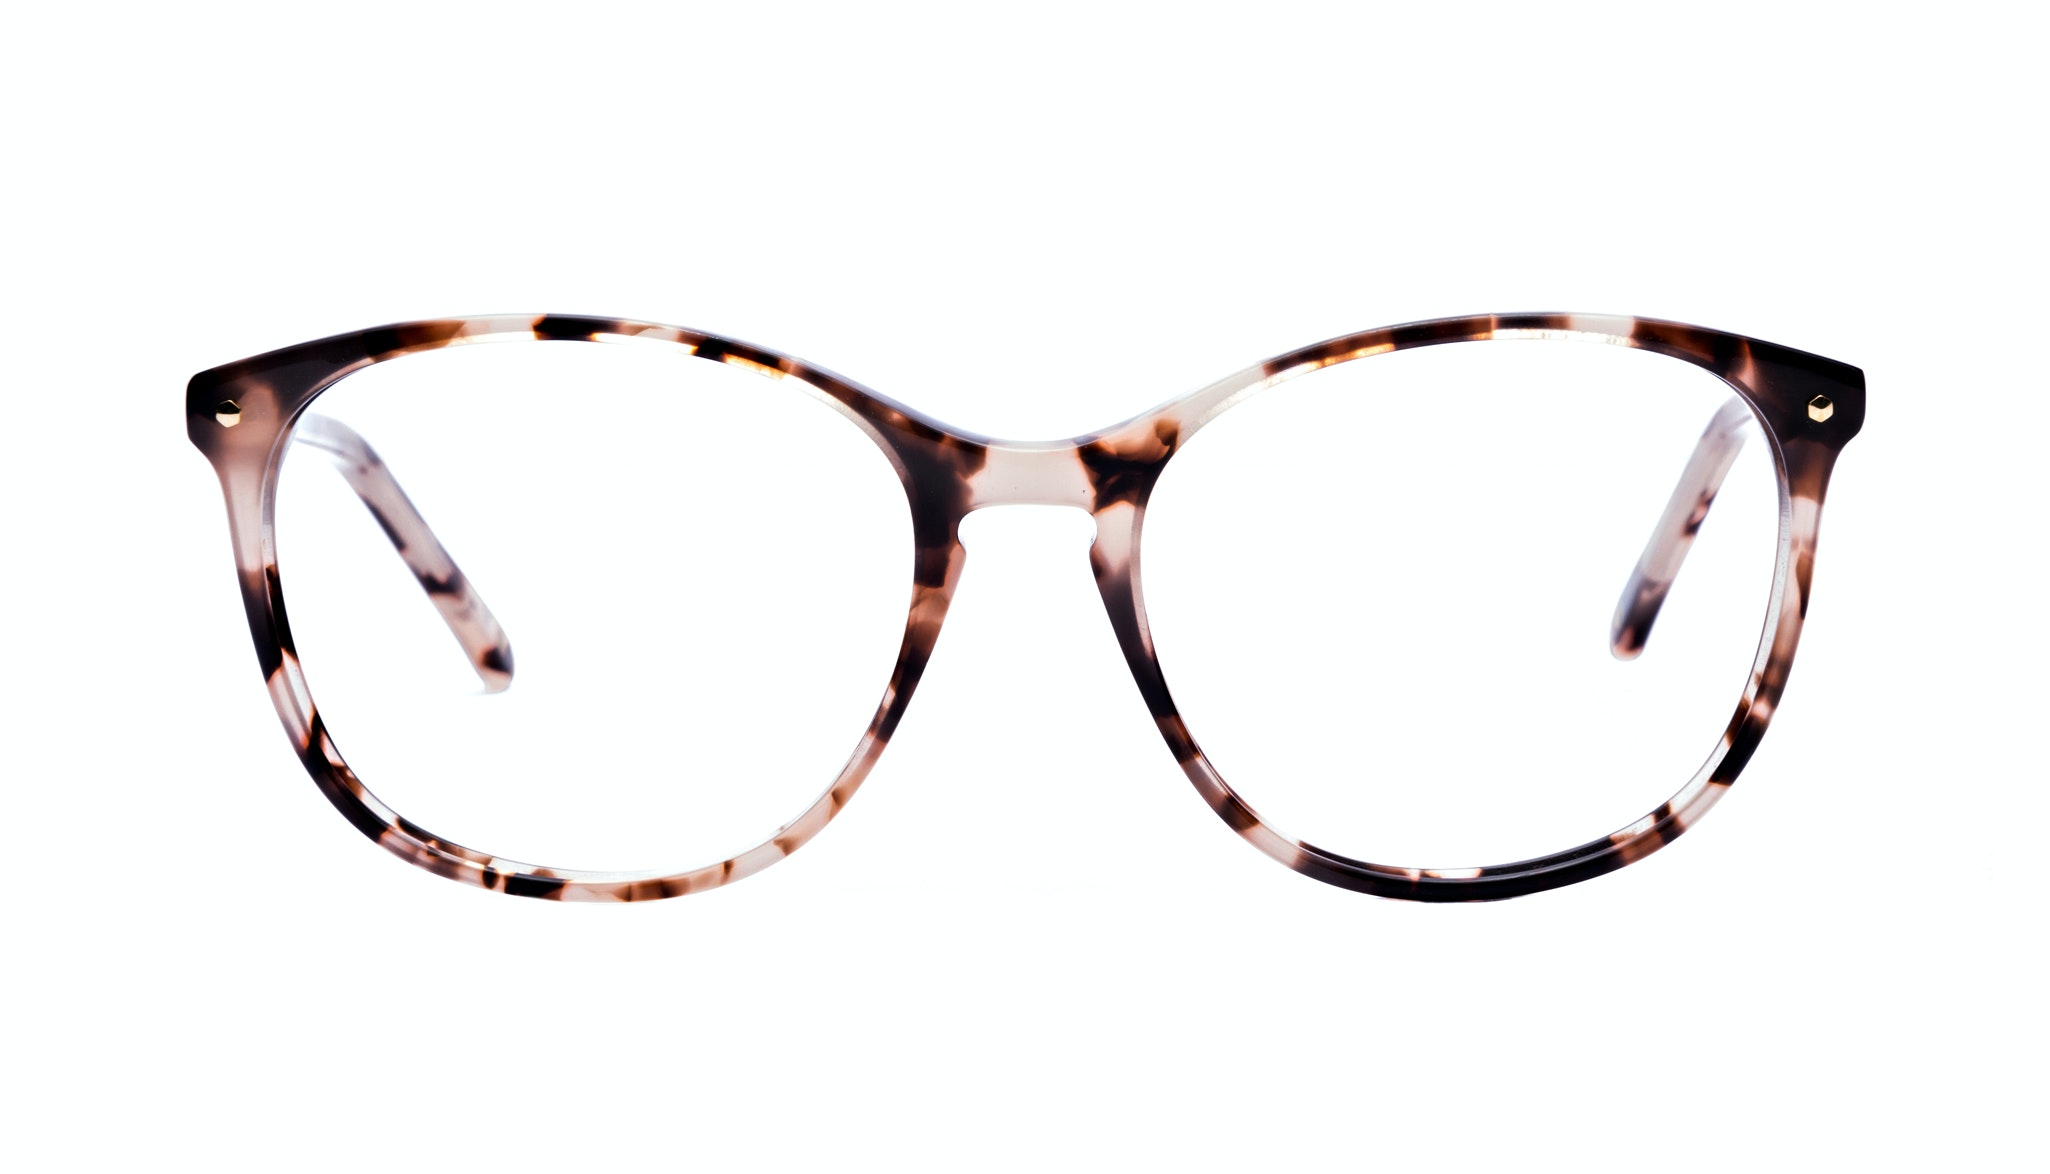 Affordable Fashion Glasses Rectangle Square Round Eyeglasses Women Nadine Pink Tortoise